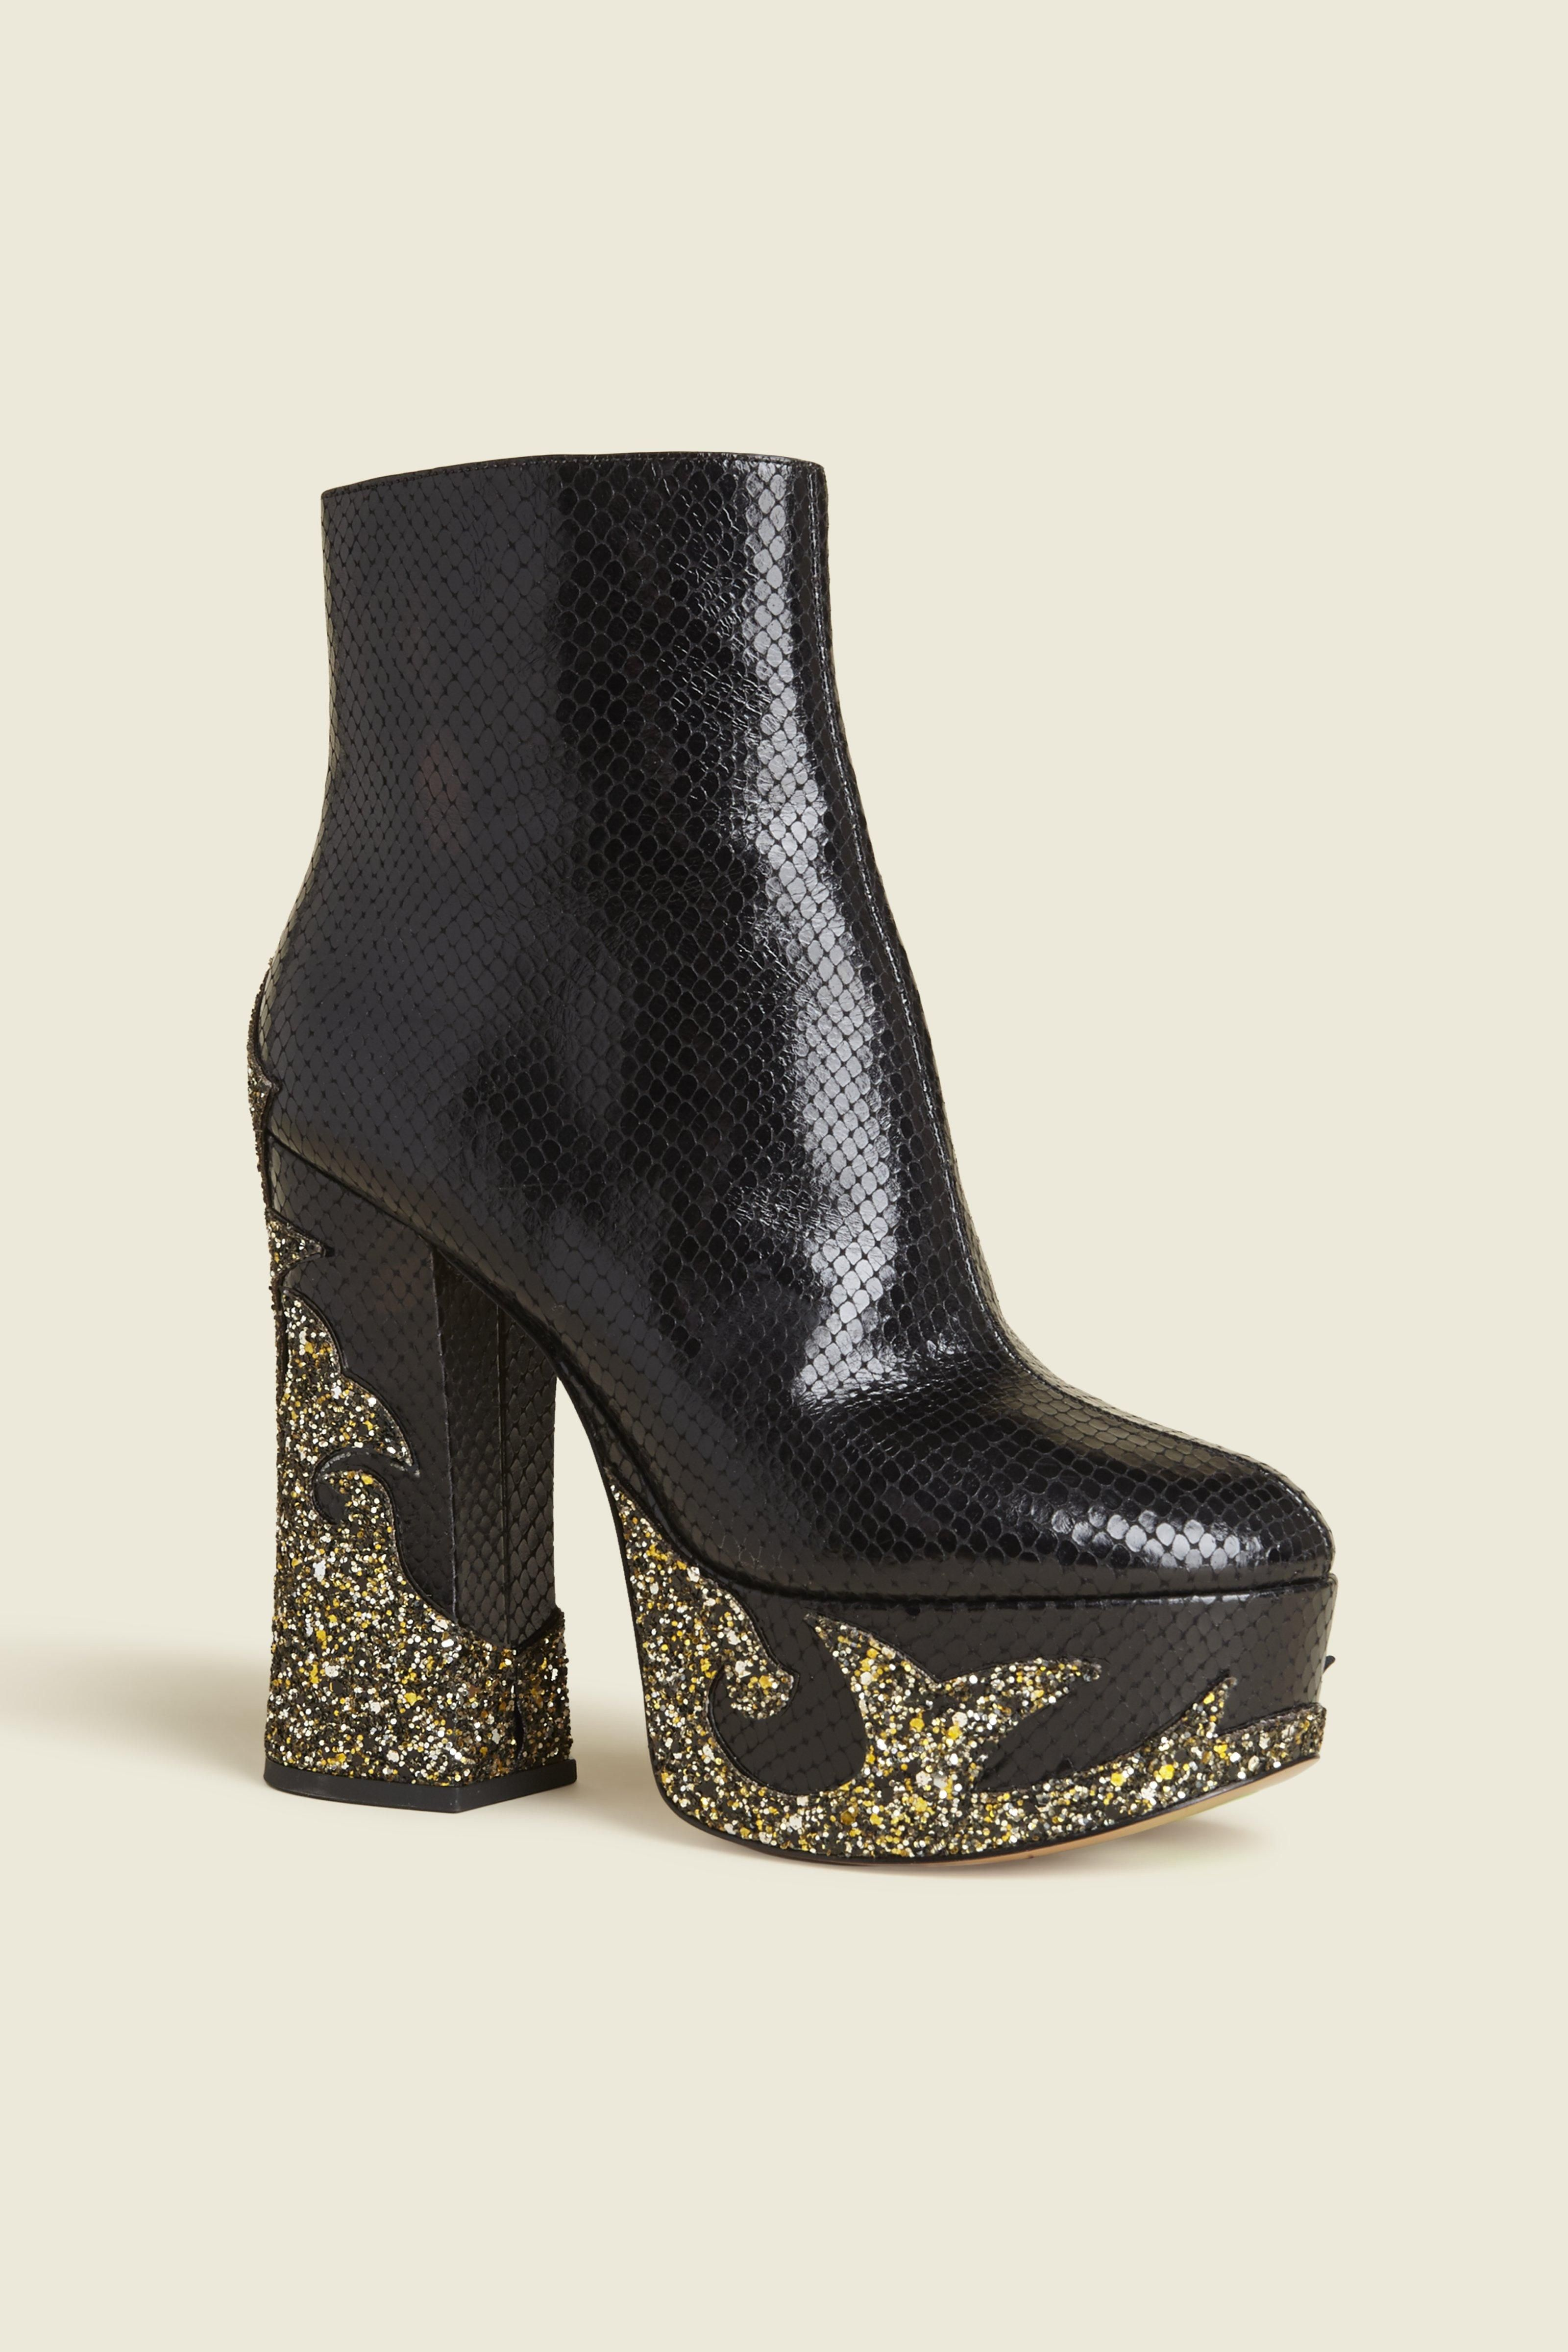 MARC JACOBS Stasha Platform Boot.  marcjacobs  shoes   Marc Jacobs Shoes,  Chunky fe99eded63a6